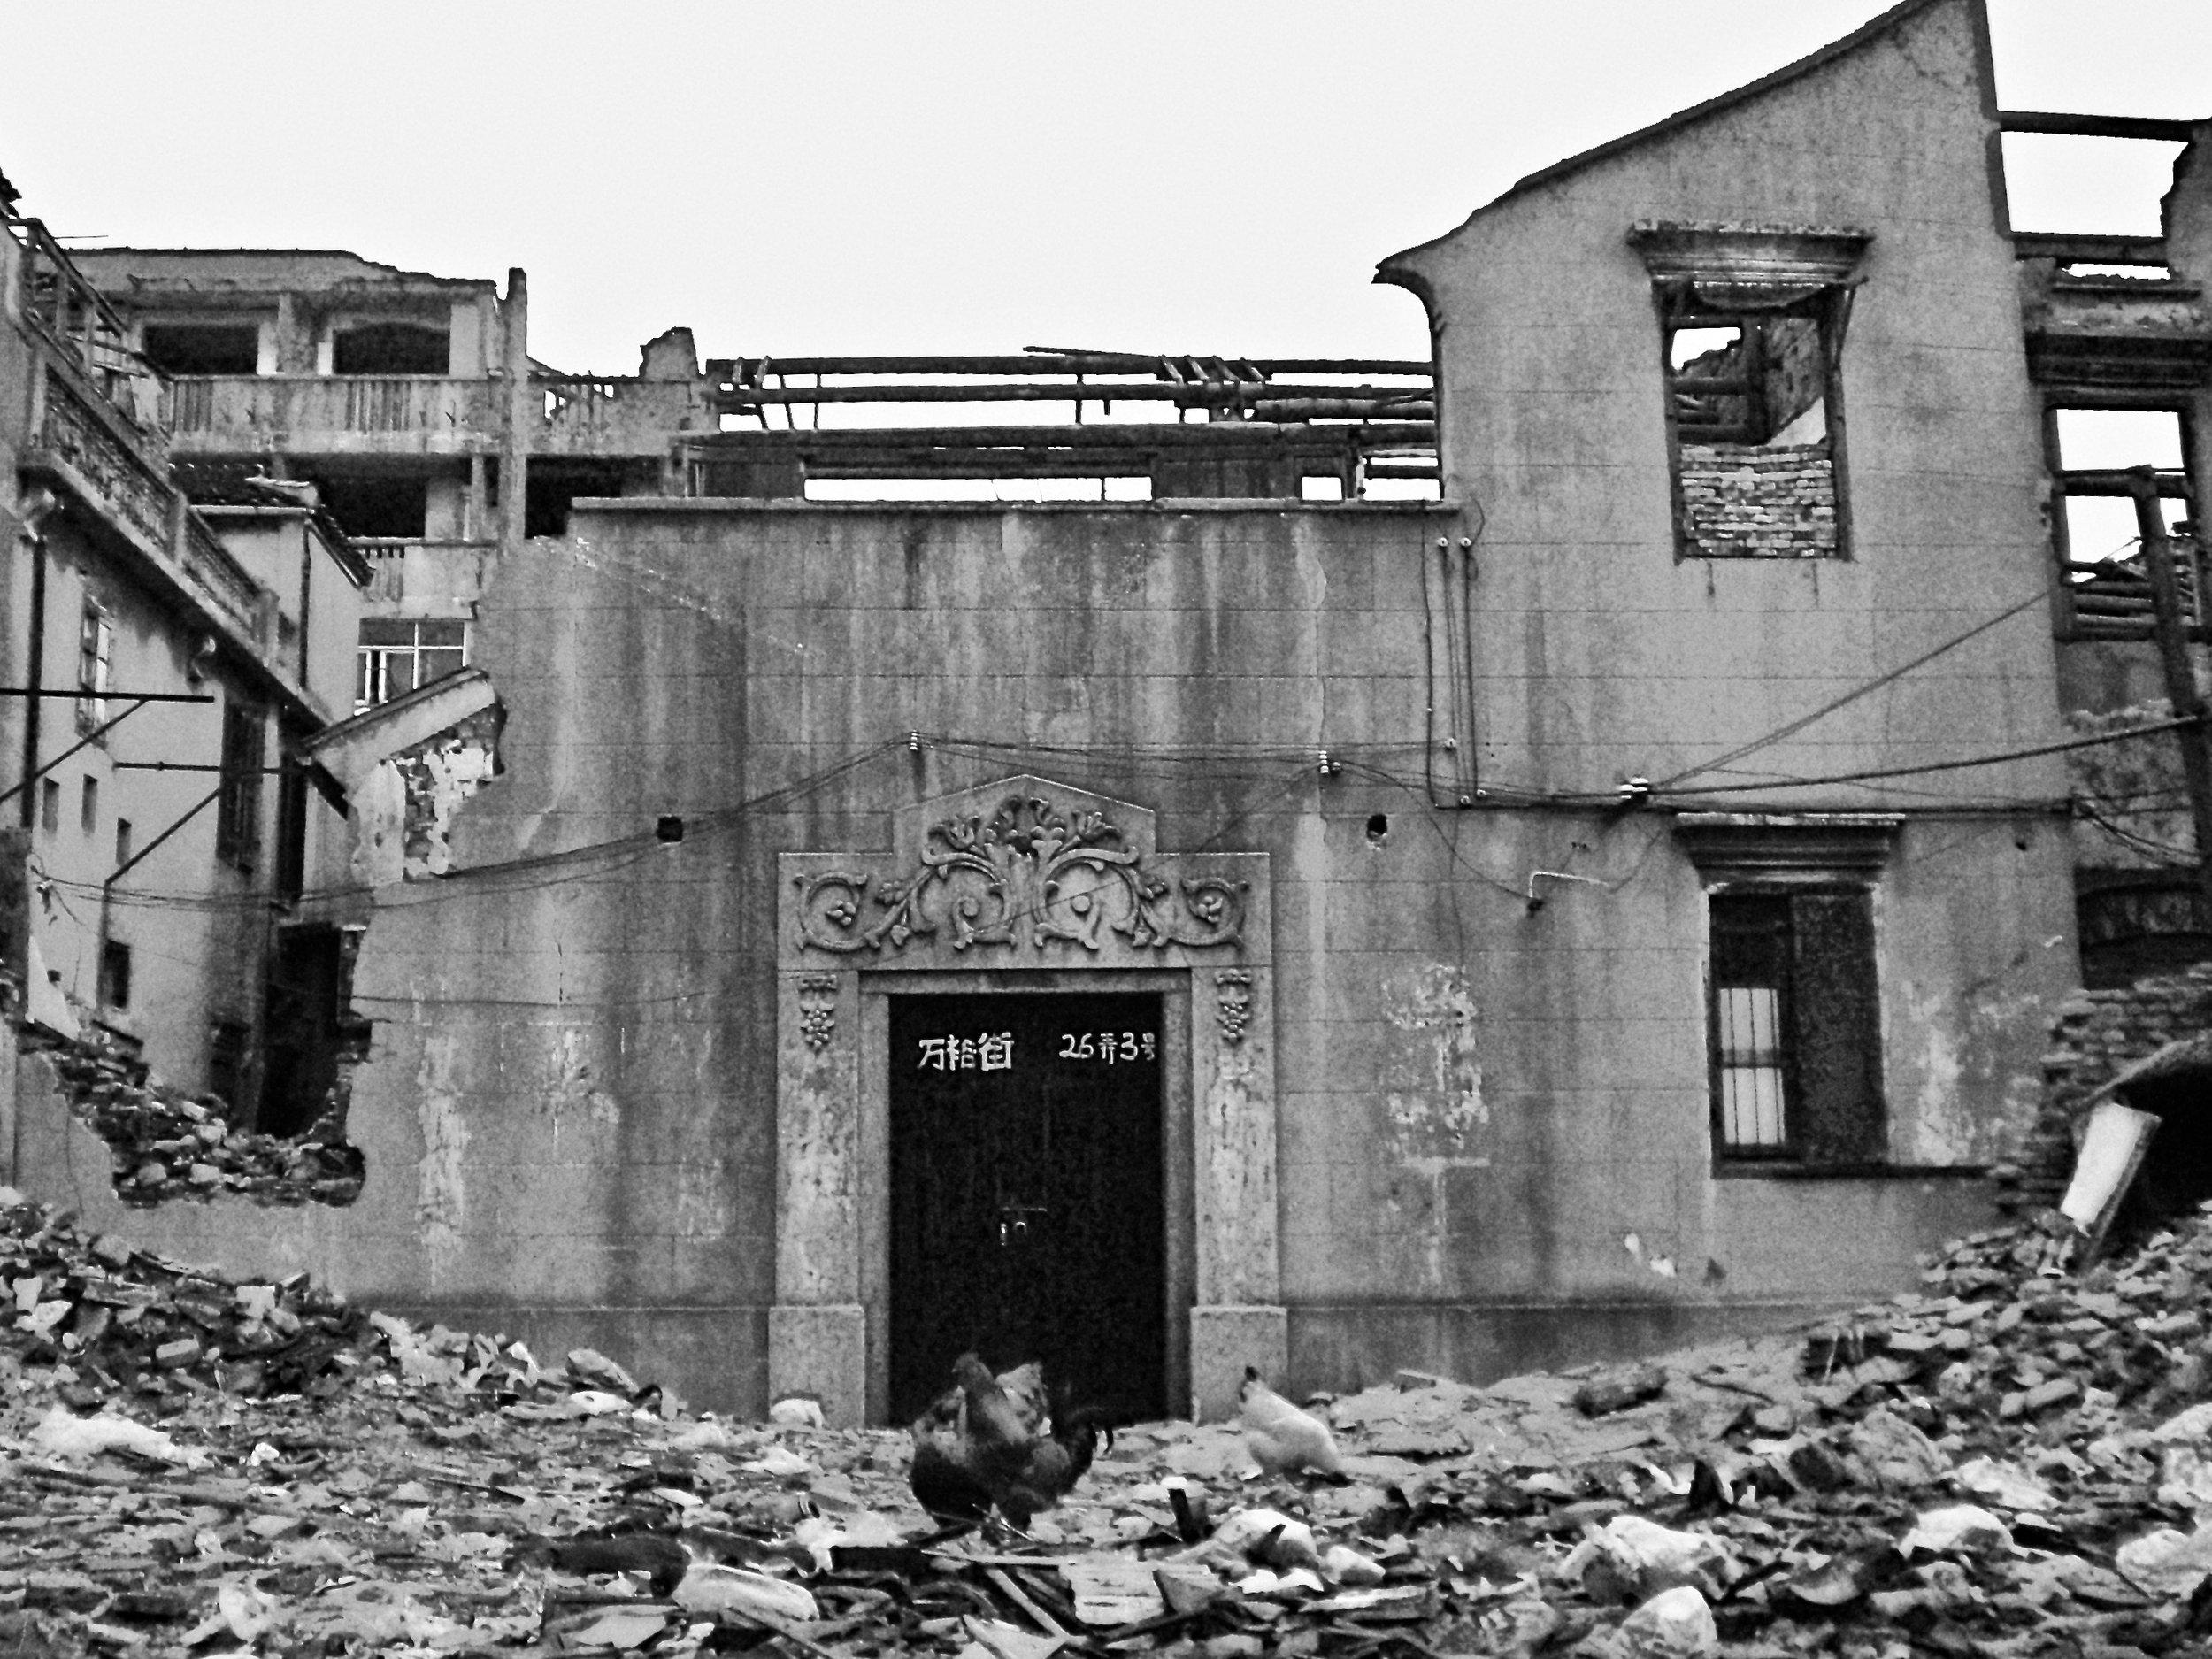 Demolished homes in Shanghai, China. (C) Remko Tanis